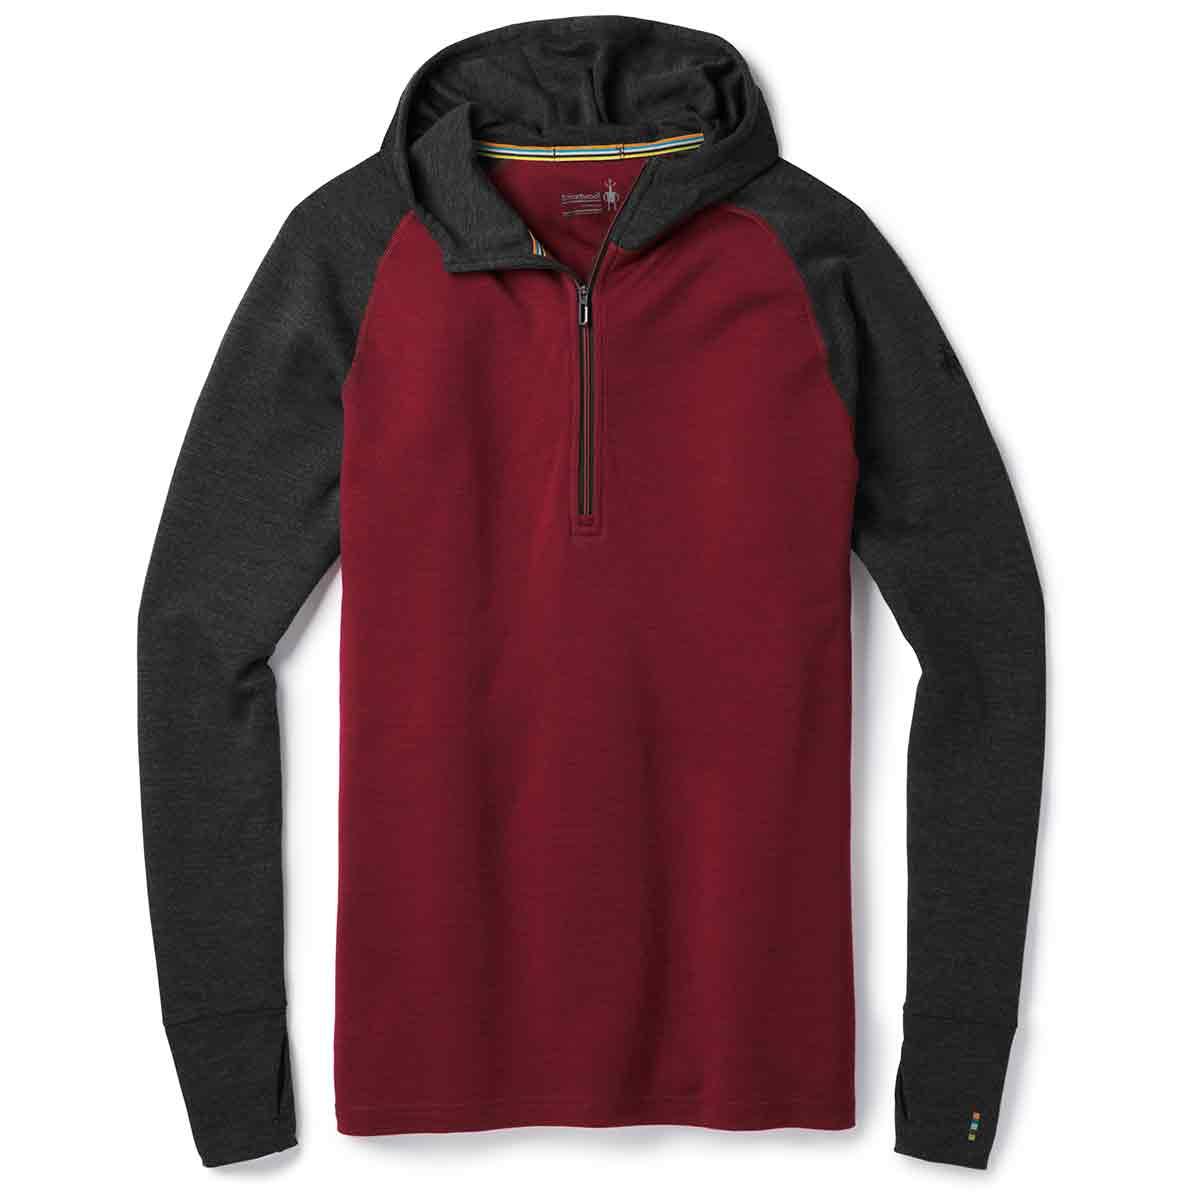 Smartwool Men's Merino 250 Base Layer Hoodie - Red, M